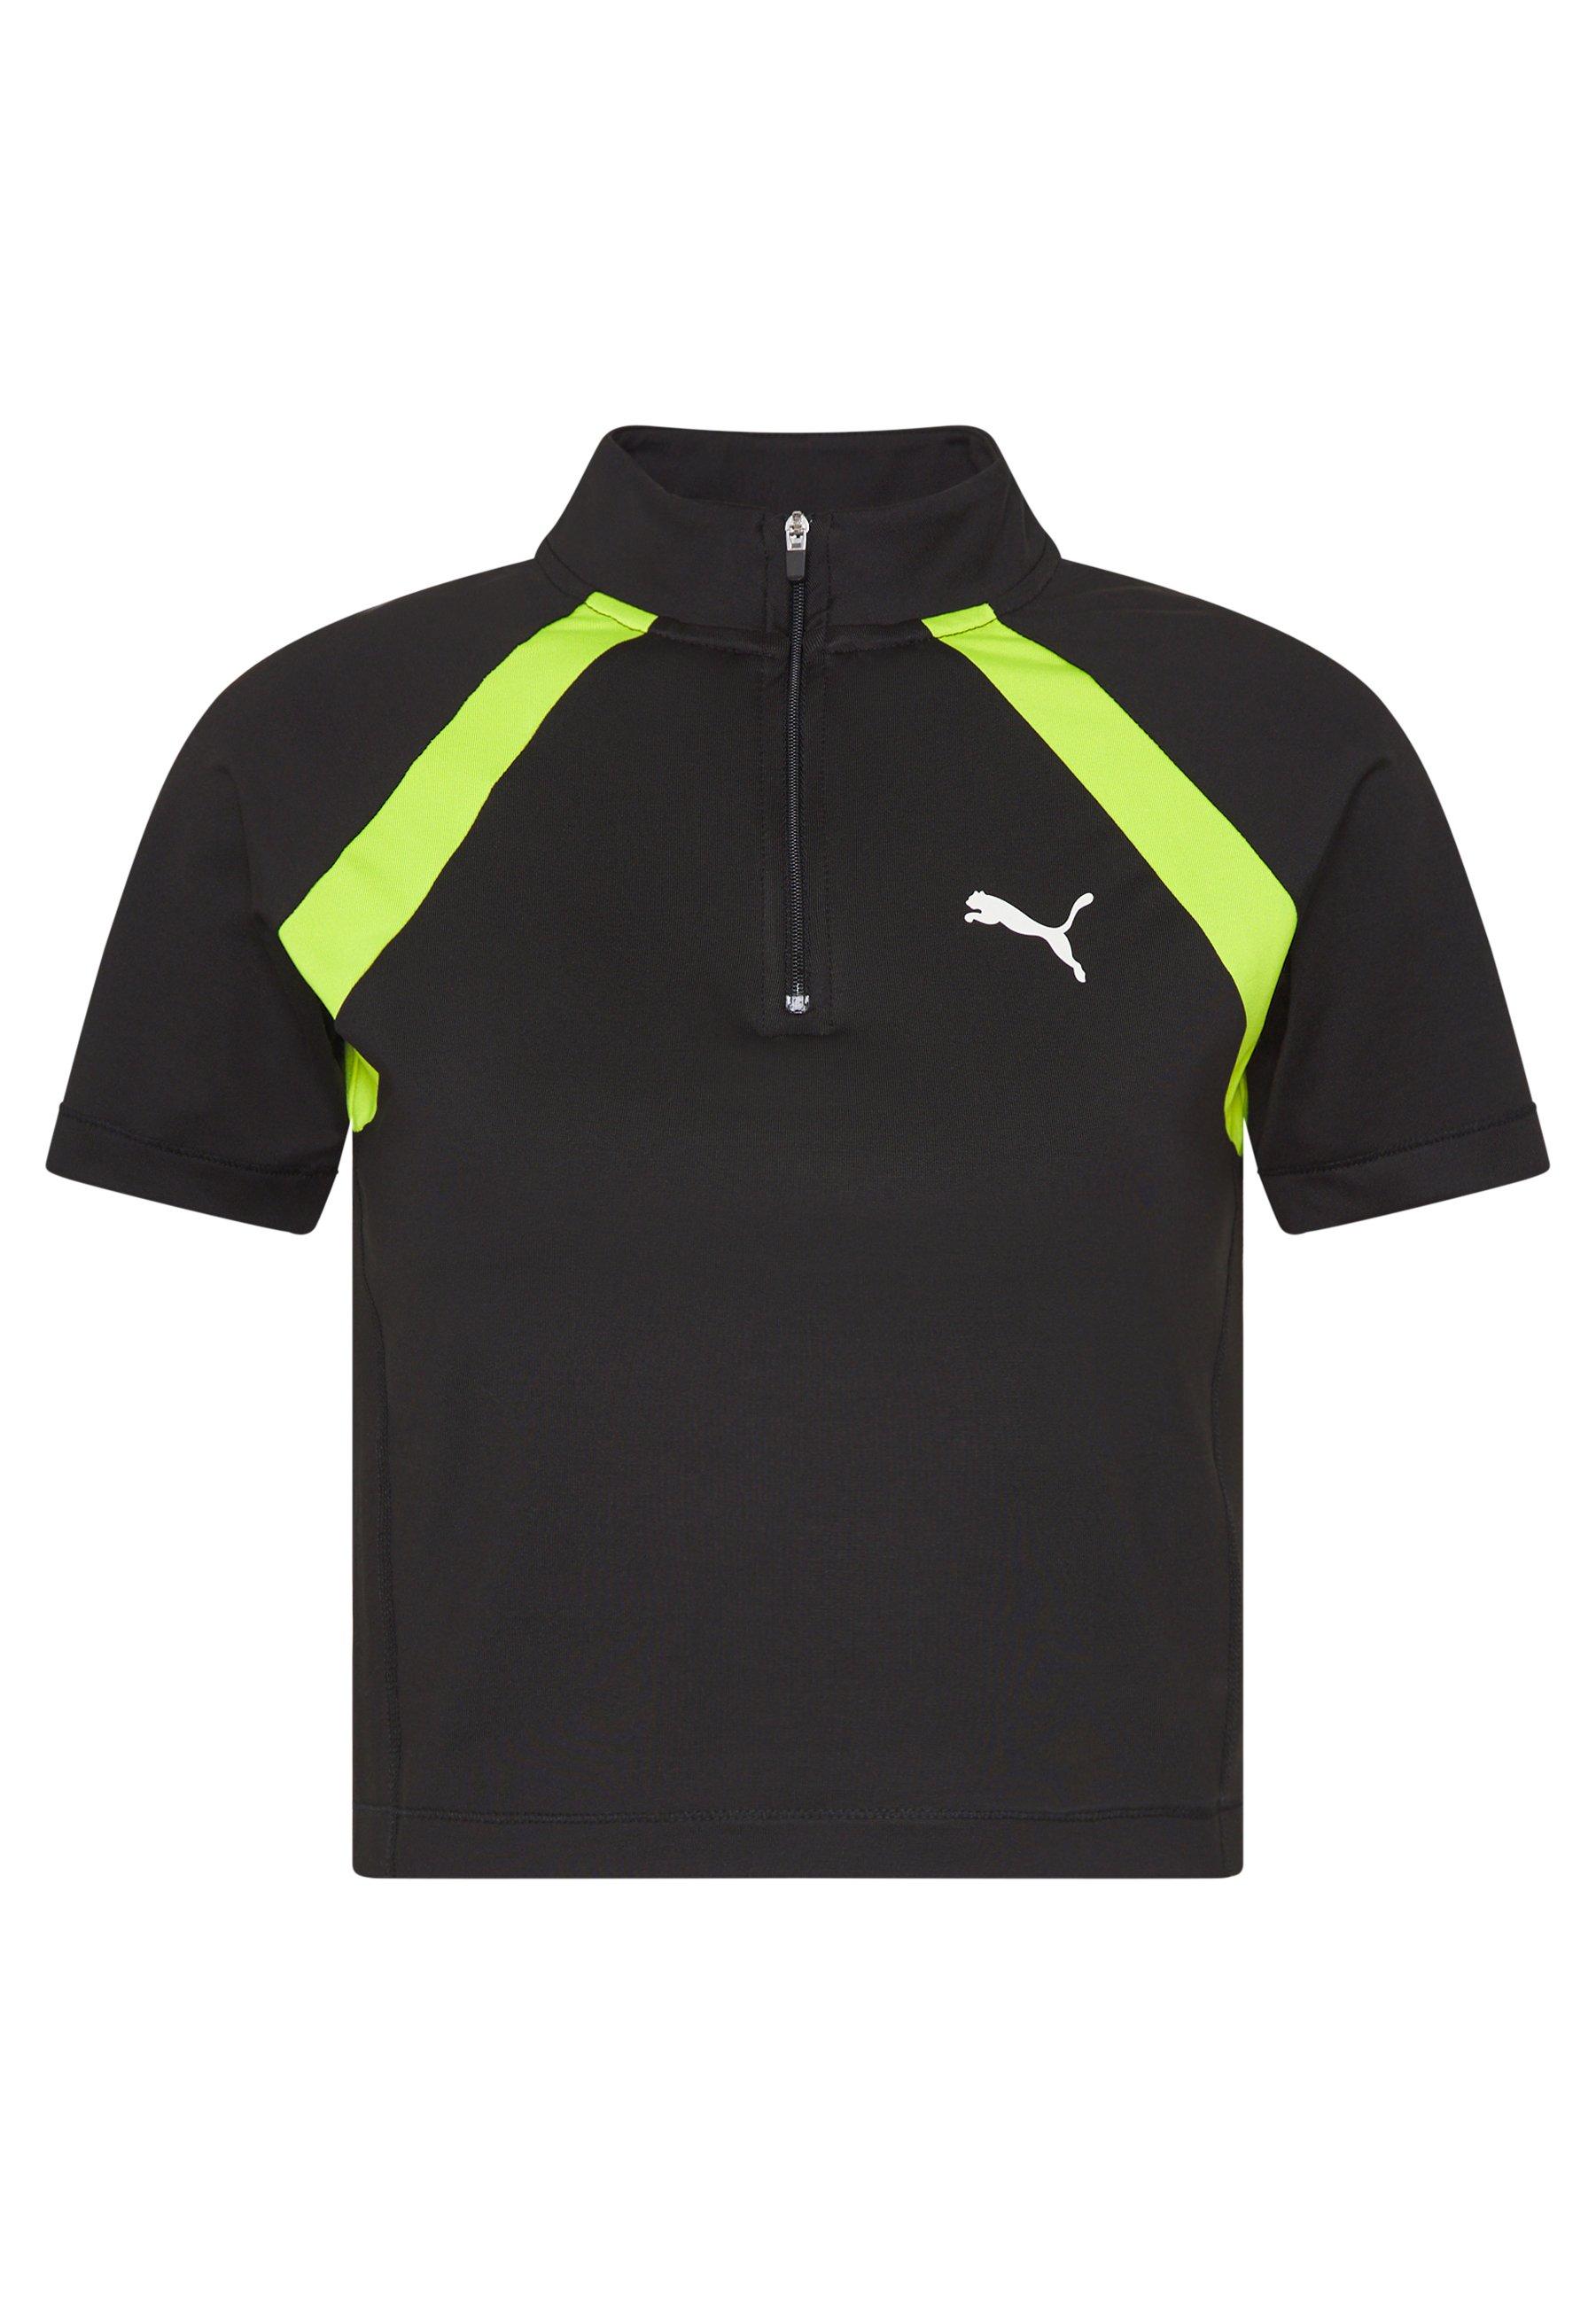 Puma Studio Clash Active Cropped Tee - T-shirt Med Print Black